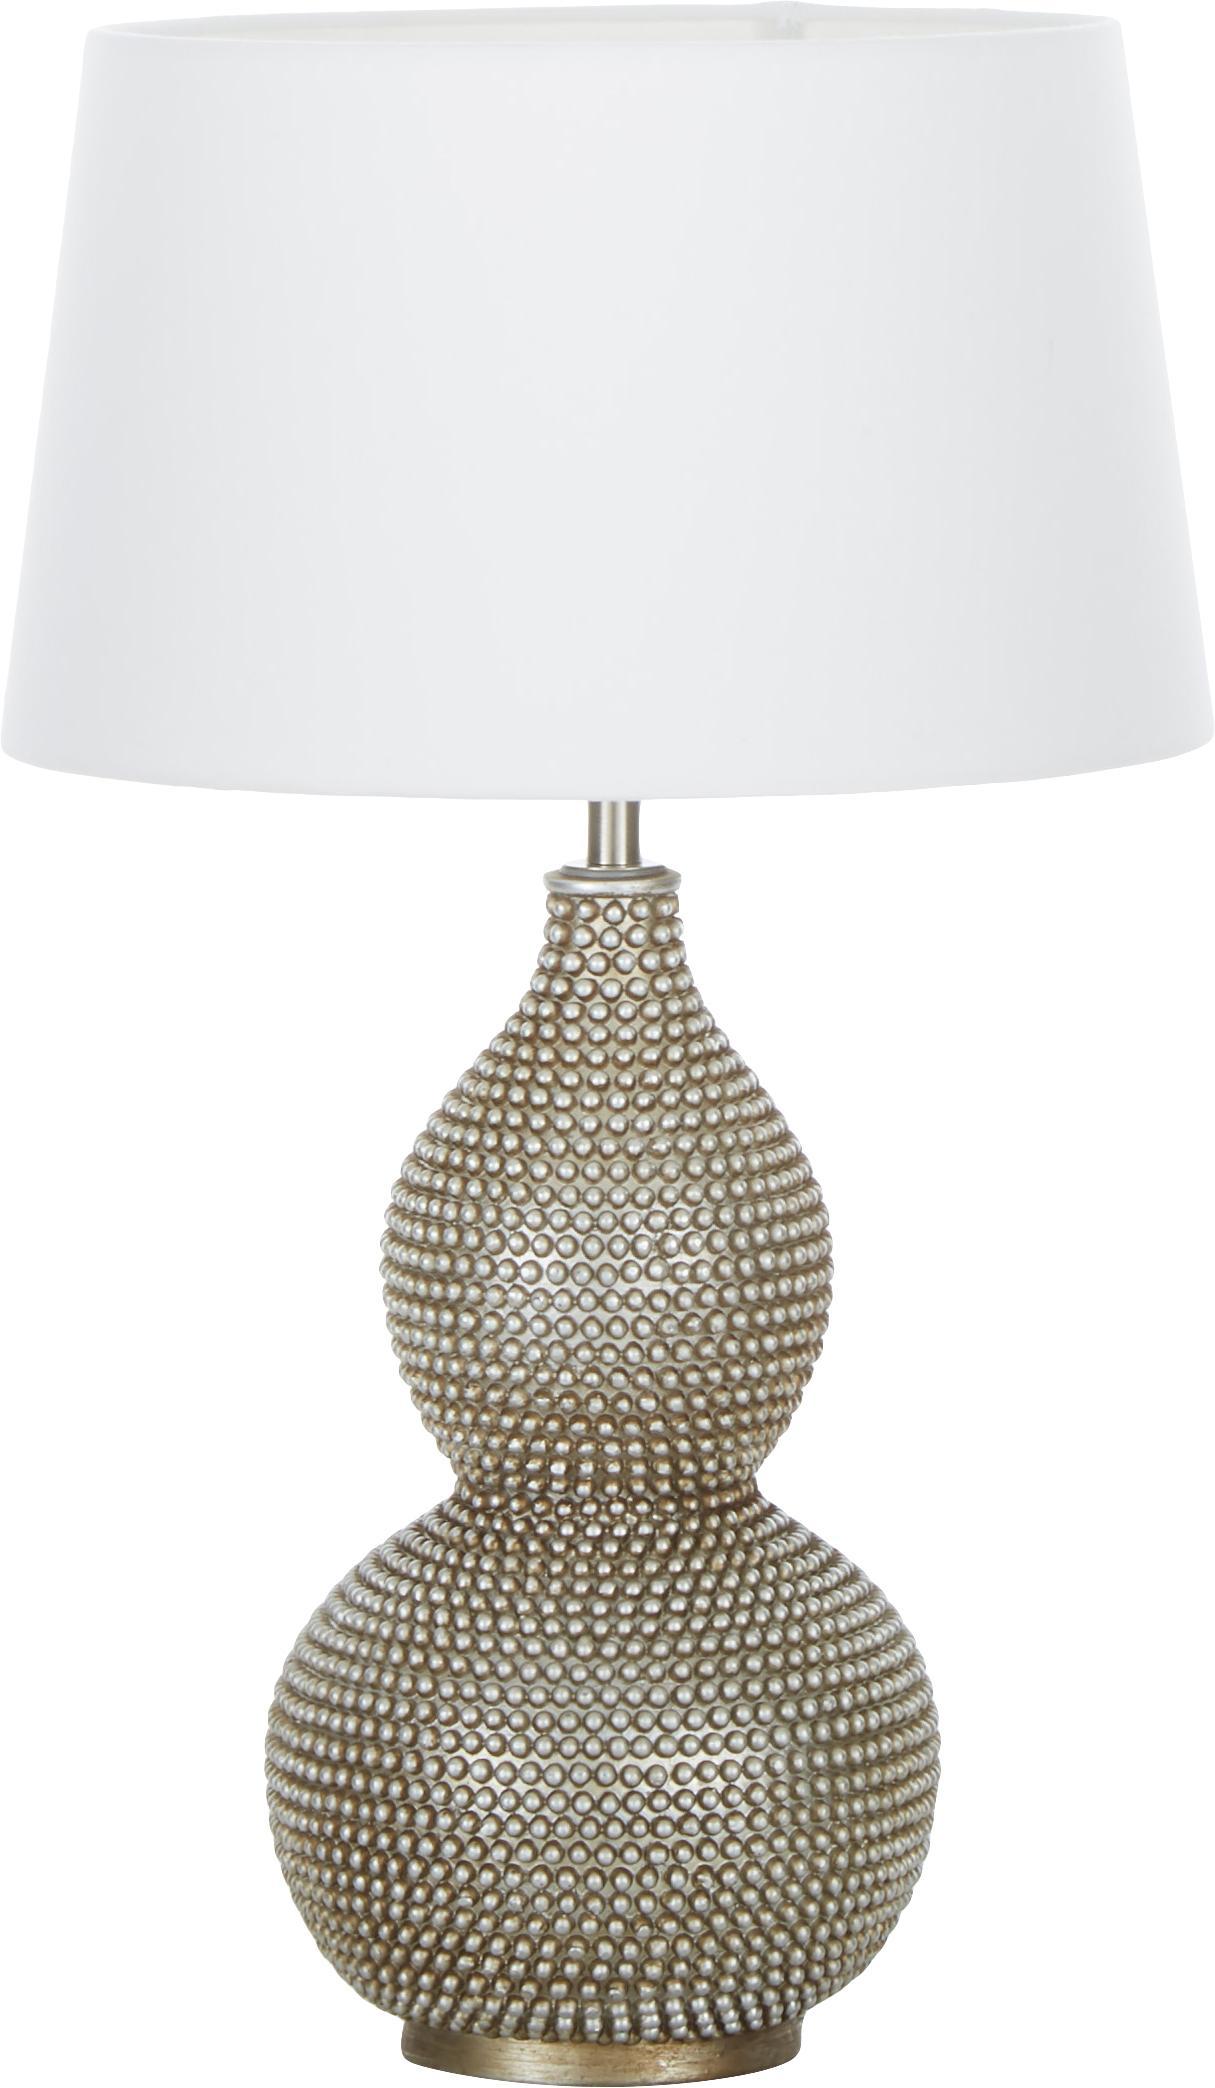 Grosse Boho-Tischlampe Lofty, Lampenschirm: Polyester, Weiss, Ø 33 x H 58 cm